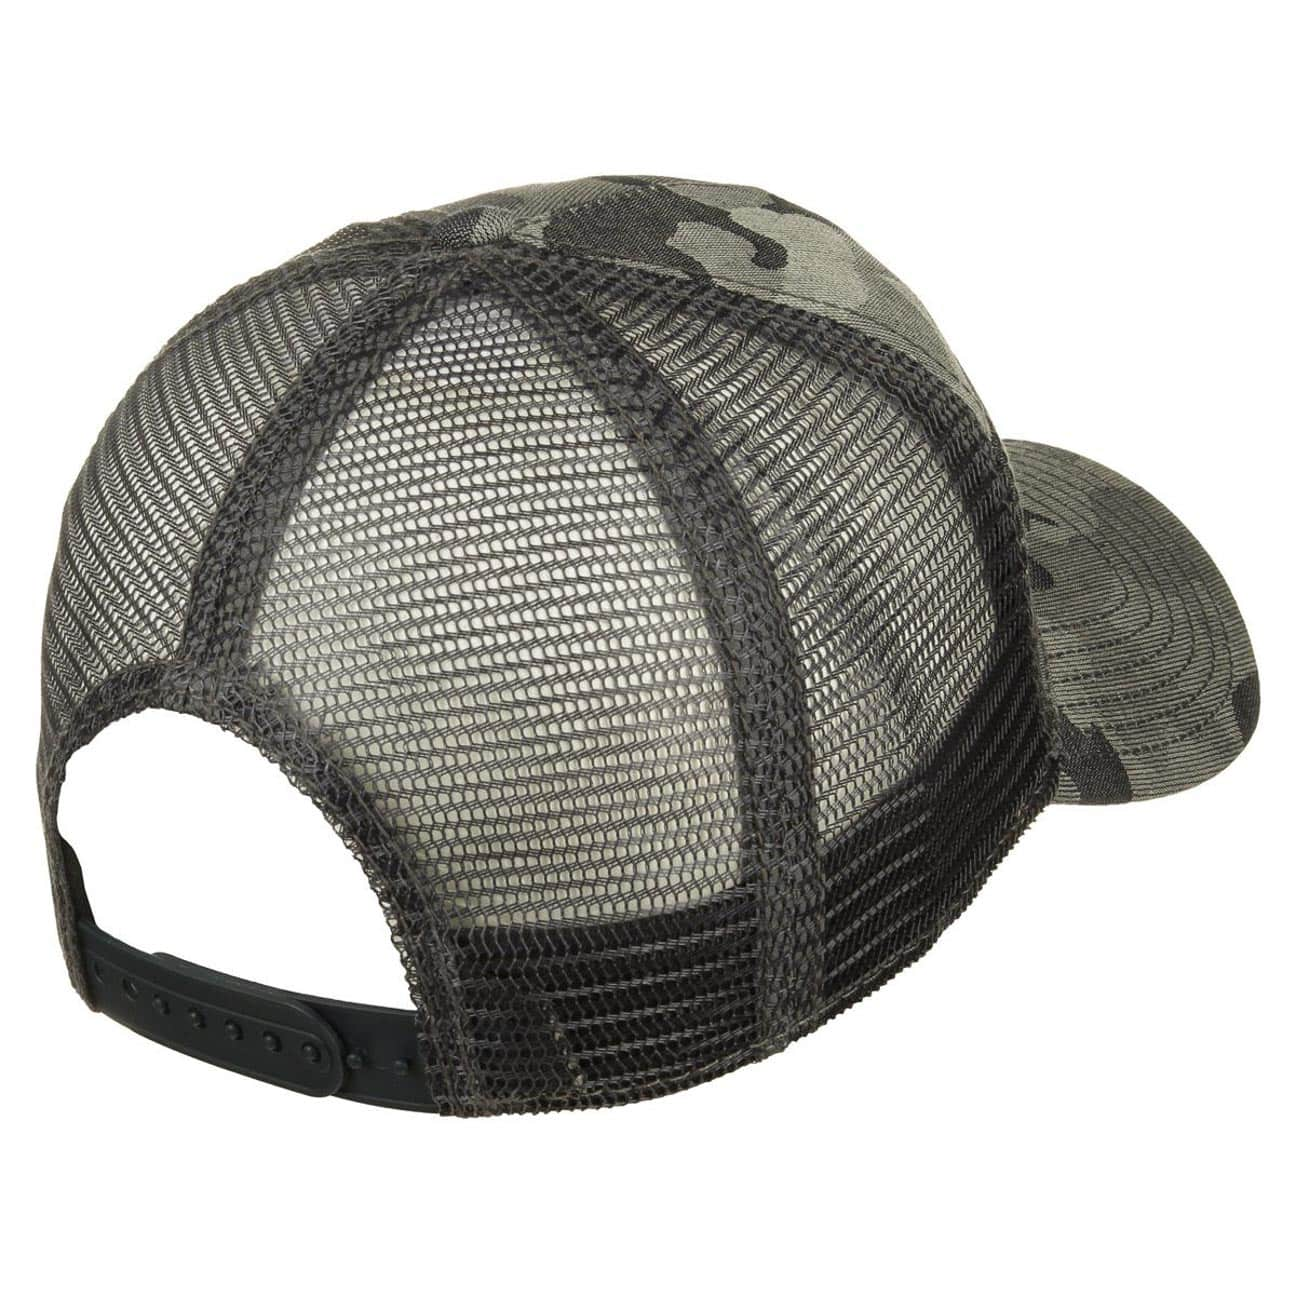 hft canvas camo trucker cap by djinns gbp 19 95 hats. Black Bedroom Furniture Sets. Home Design Ideas